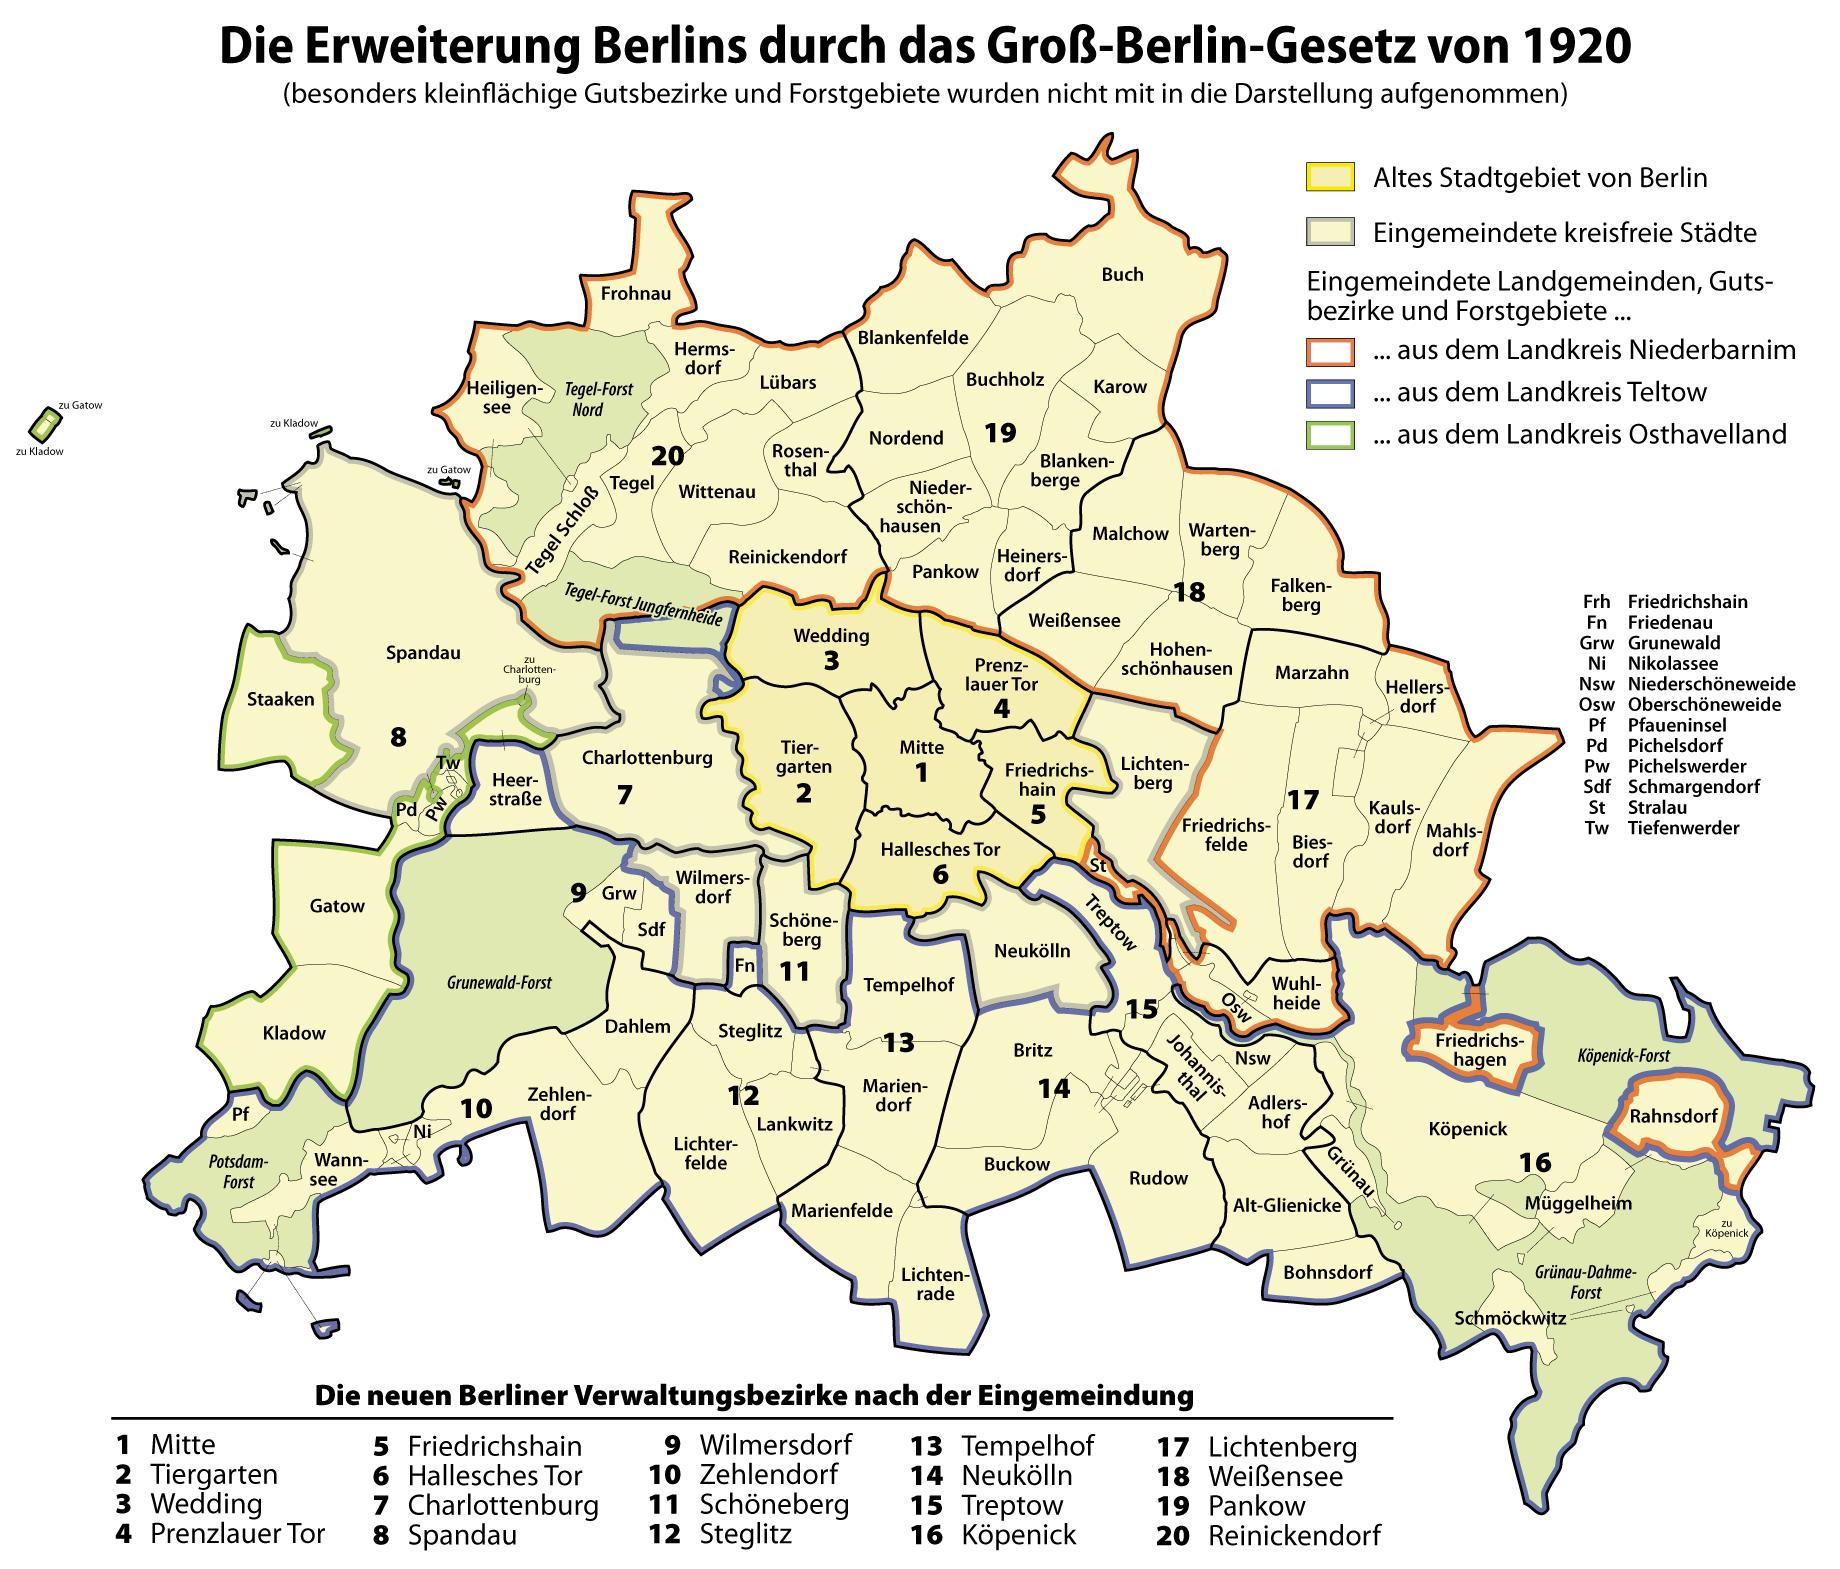 Territories merged into Berlin in 1920